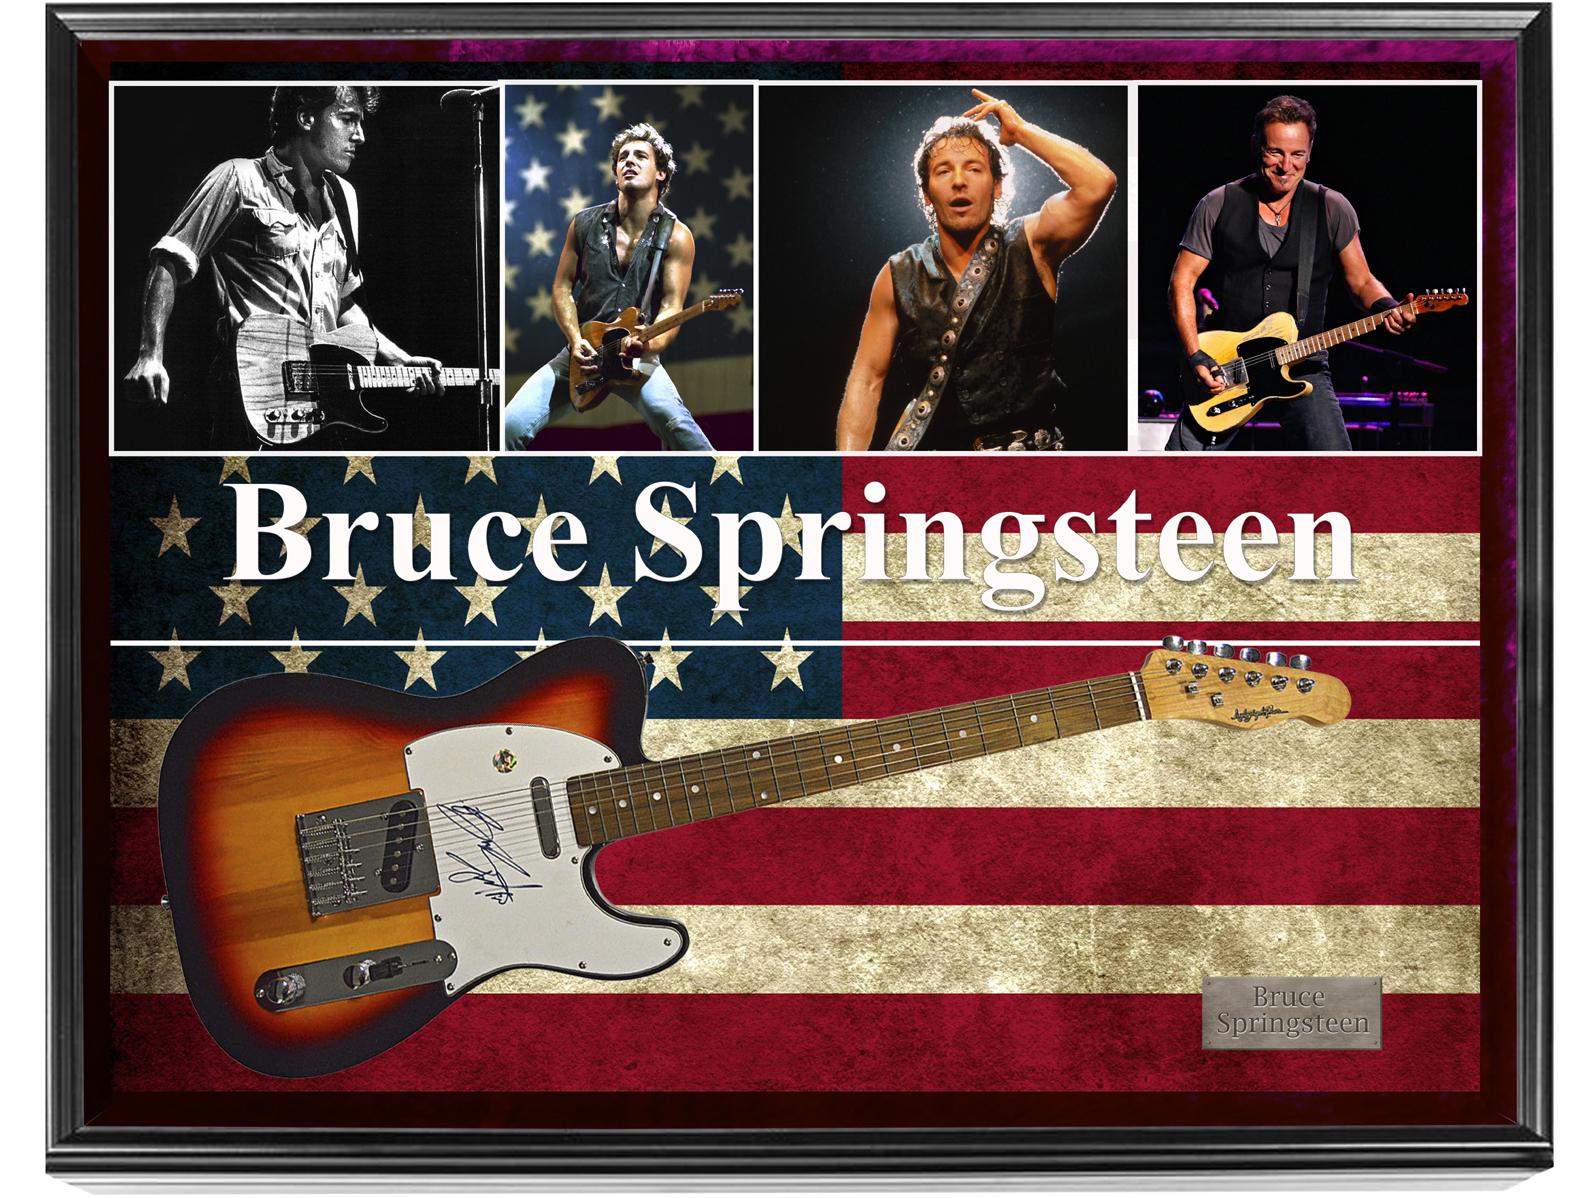 Bruce Springsteen Autographed Guitar in Custom Display Case